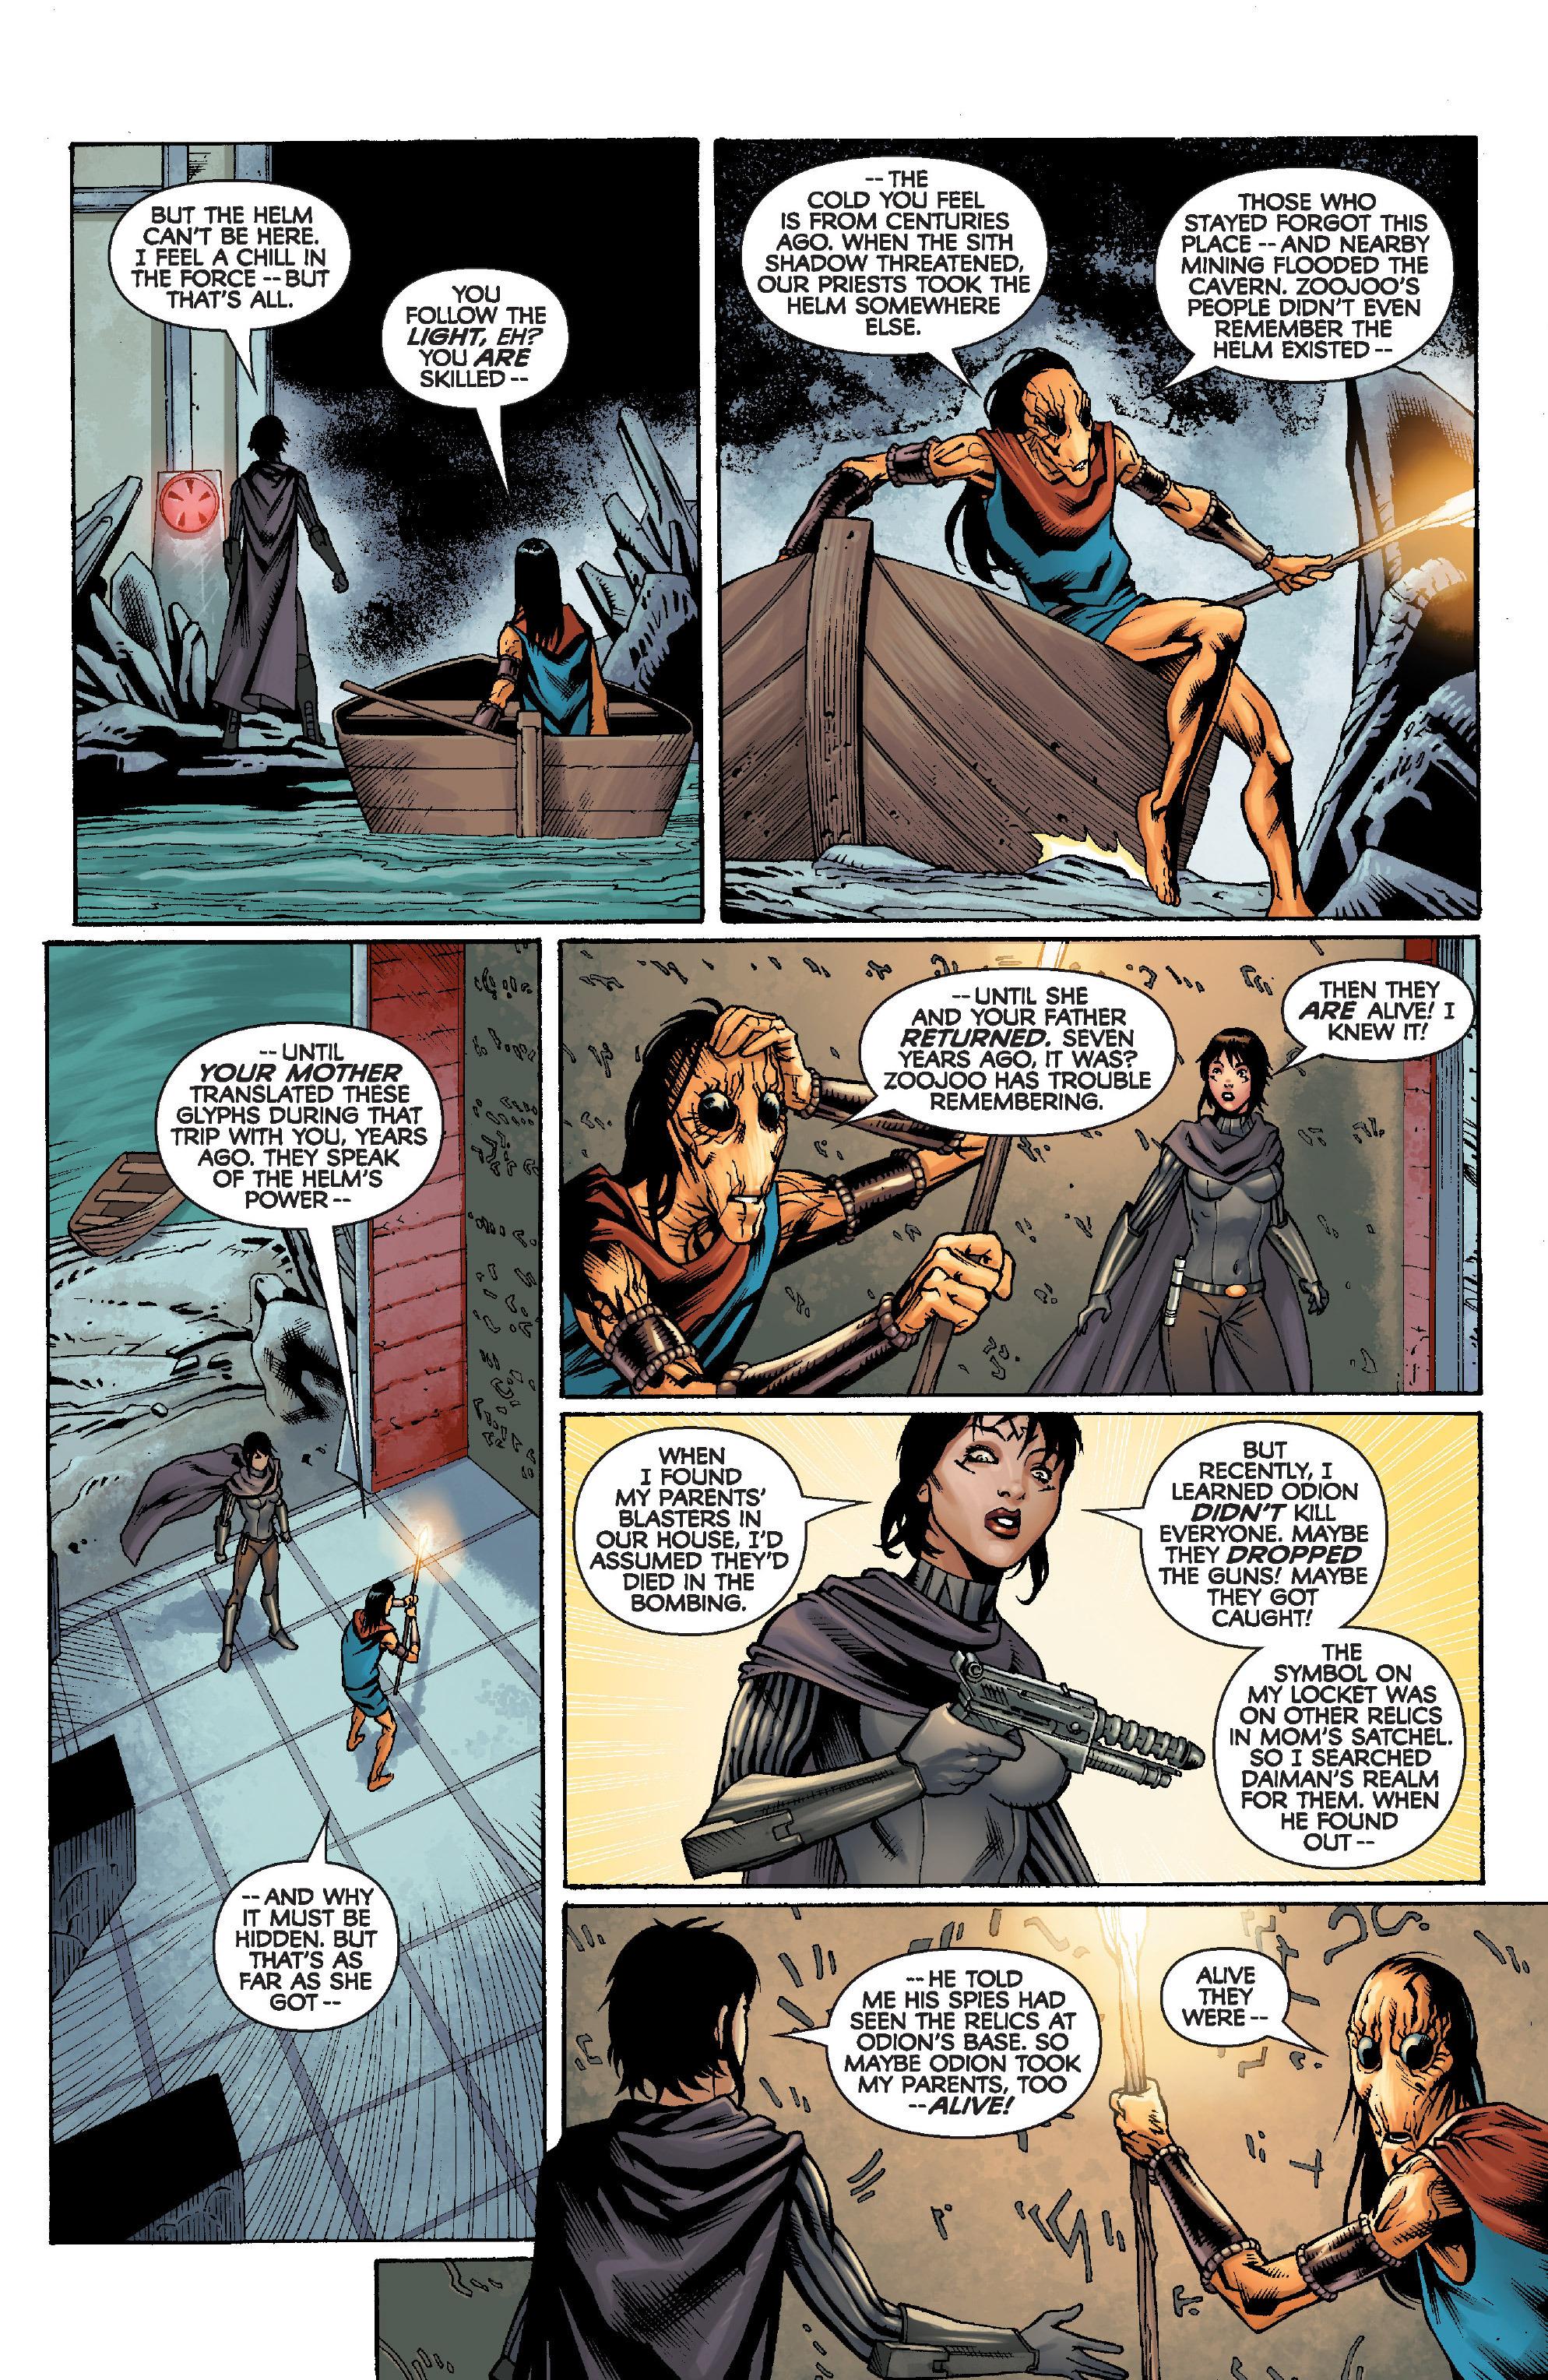 Read online Star Wars: Knight Errant - Escape comic -  Issue #2 - 15